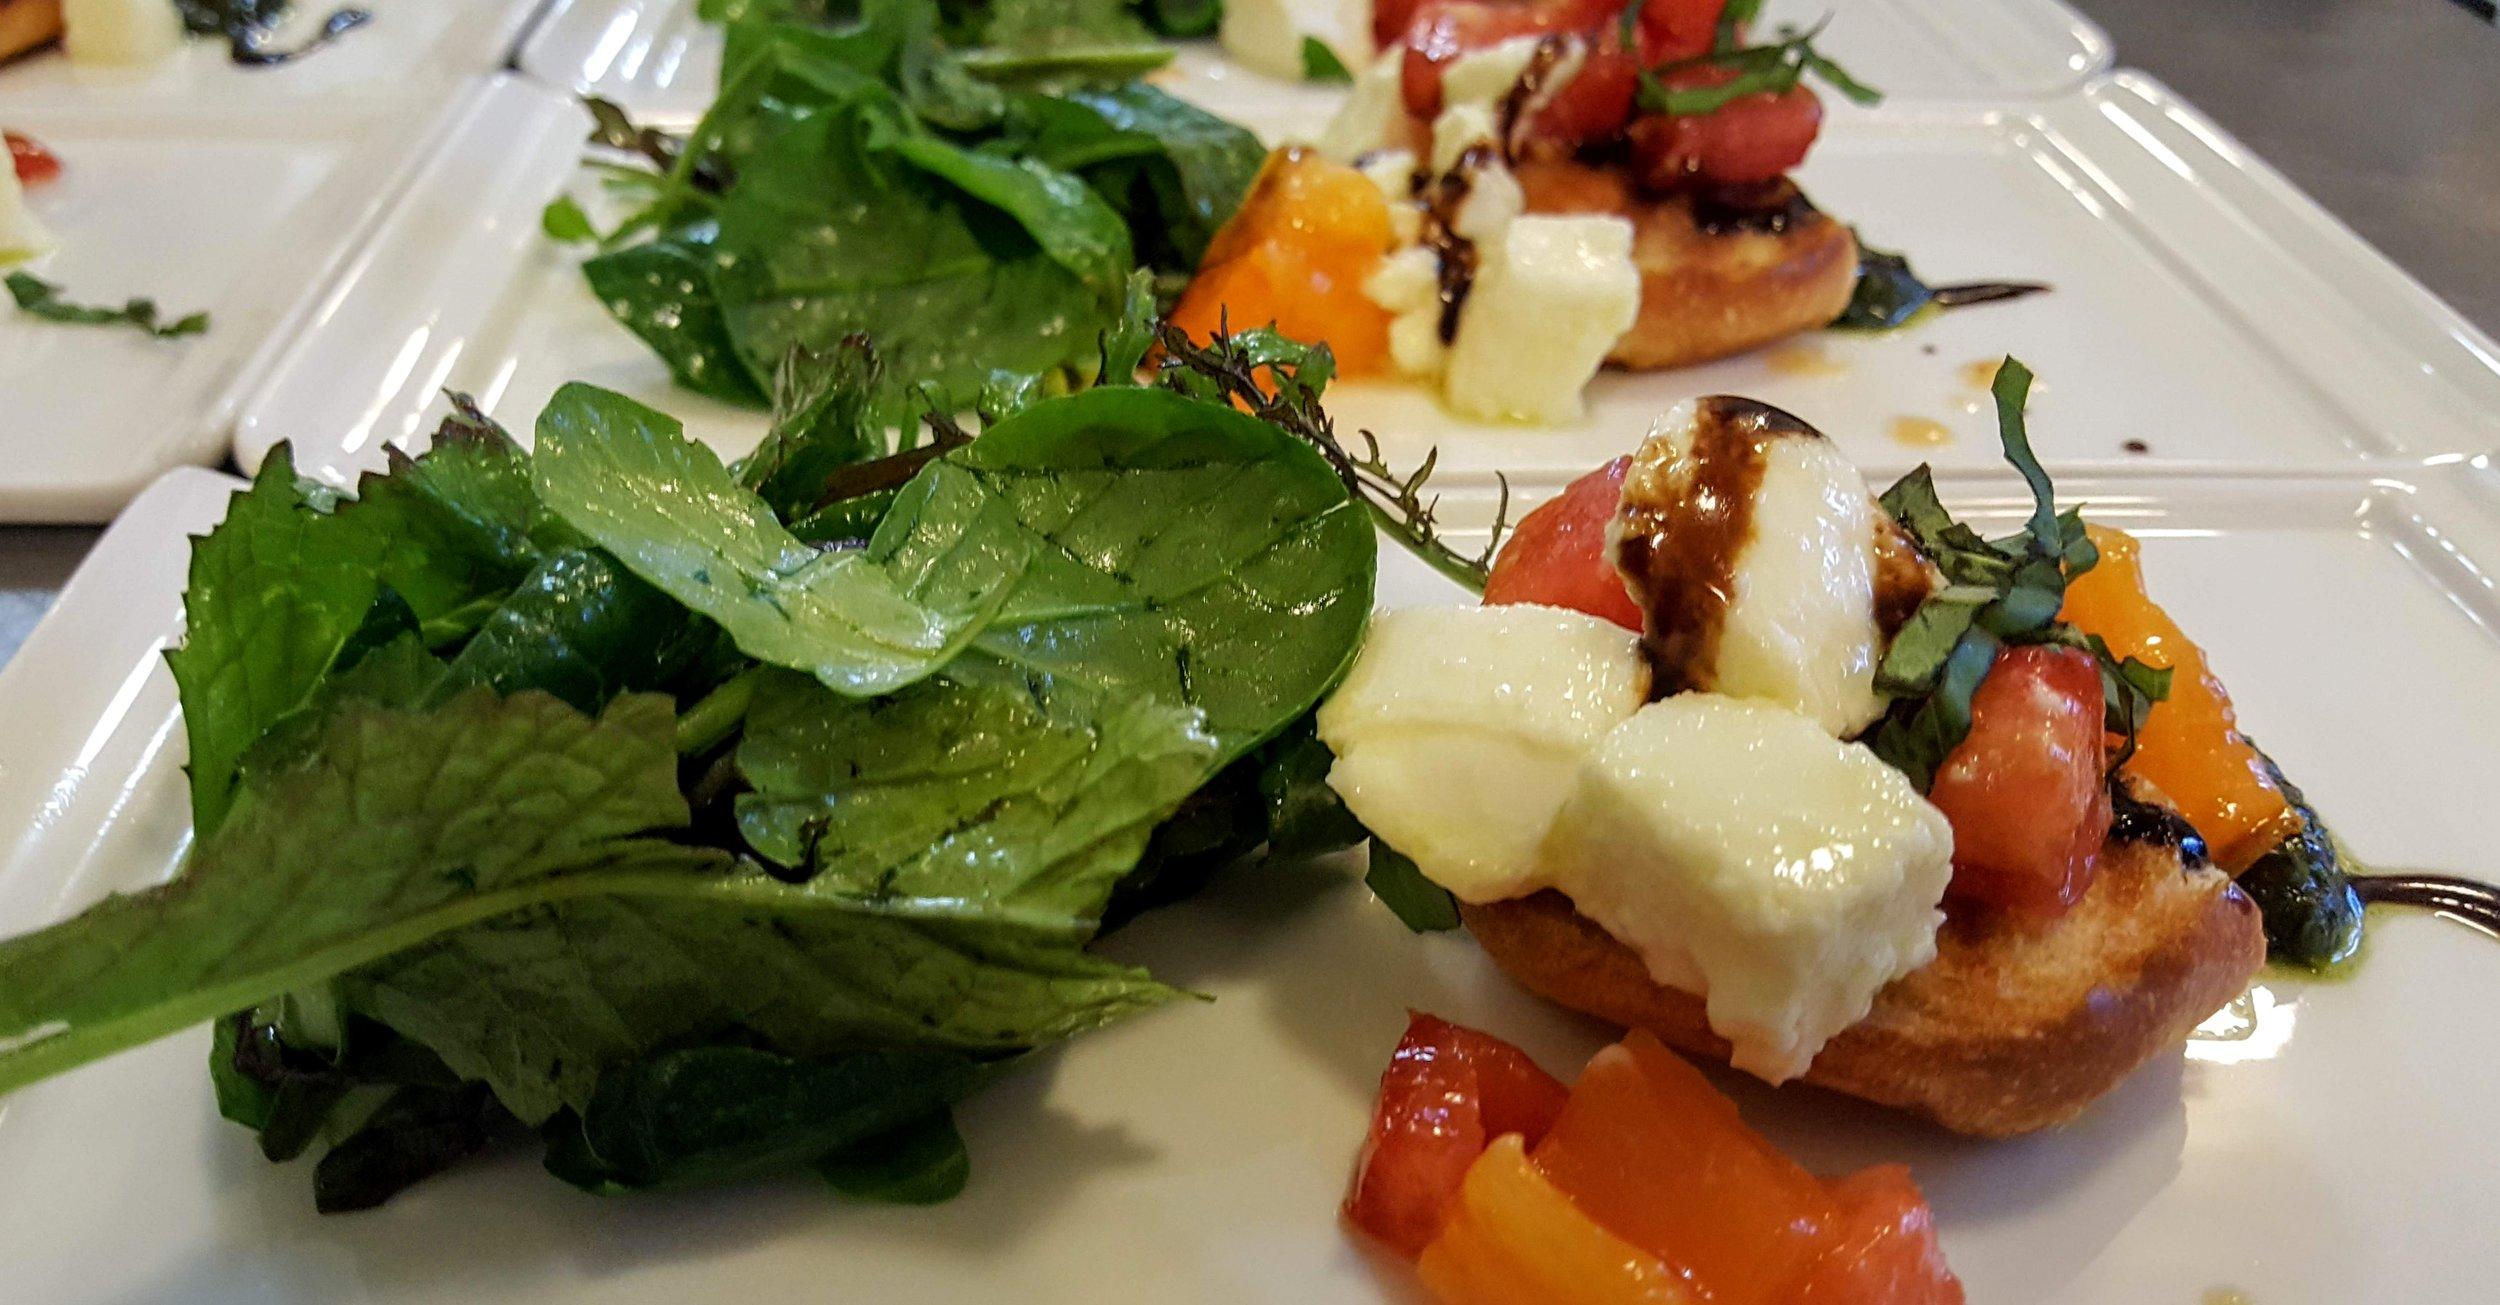 Caprese Salad  Mama Bird heirloom tomatoes, mixed greens, fresh mozzarella, grilled house baguette, balsamic reduction, pesto